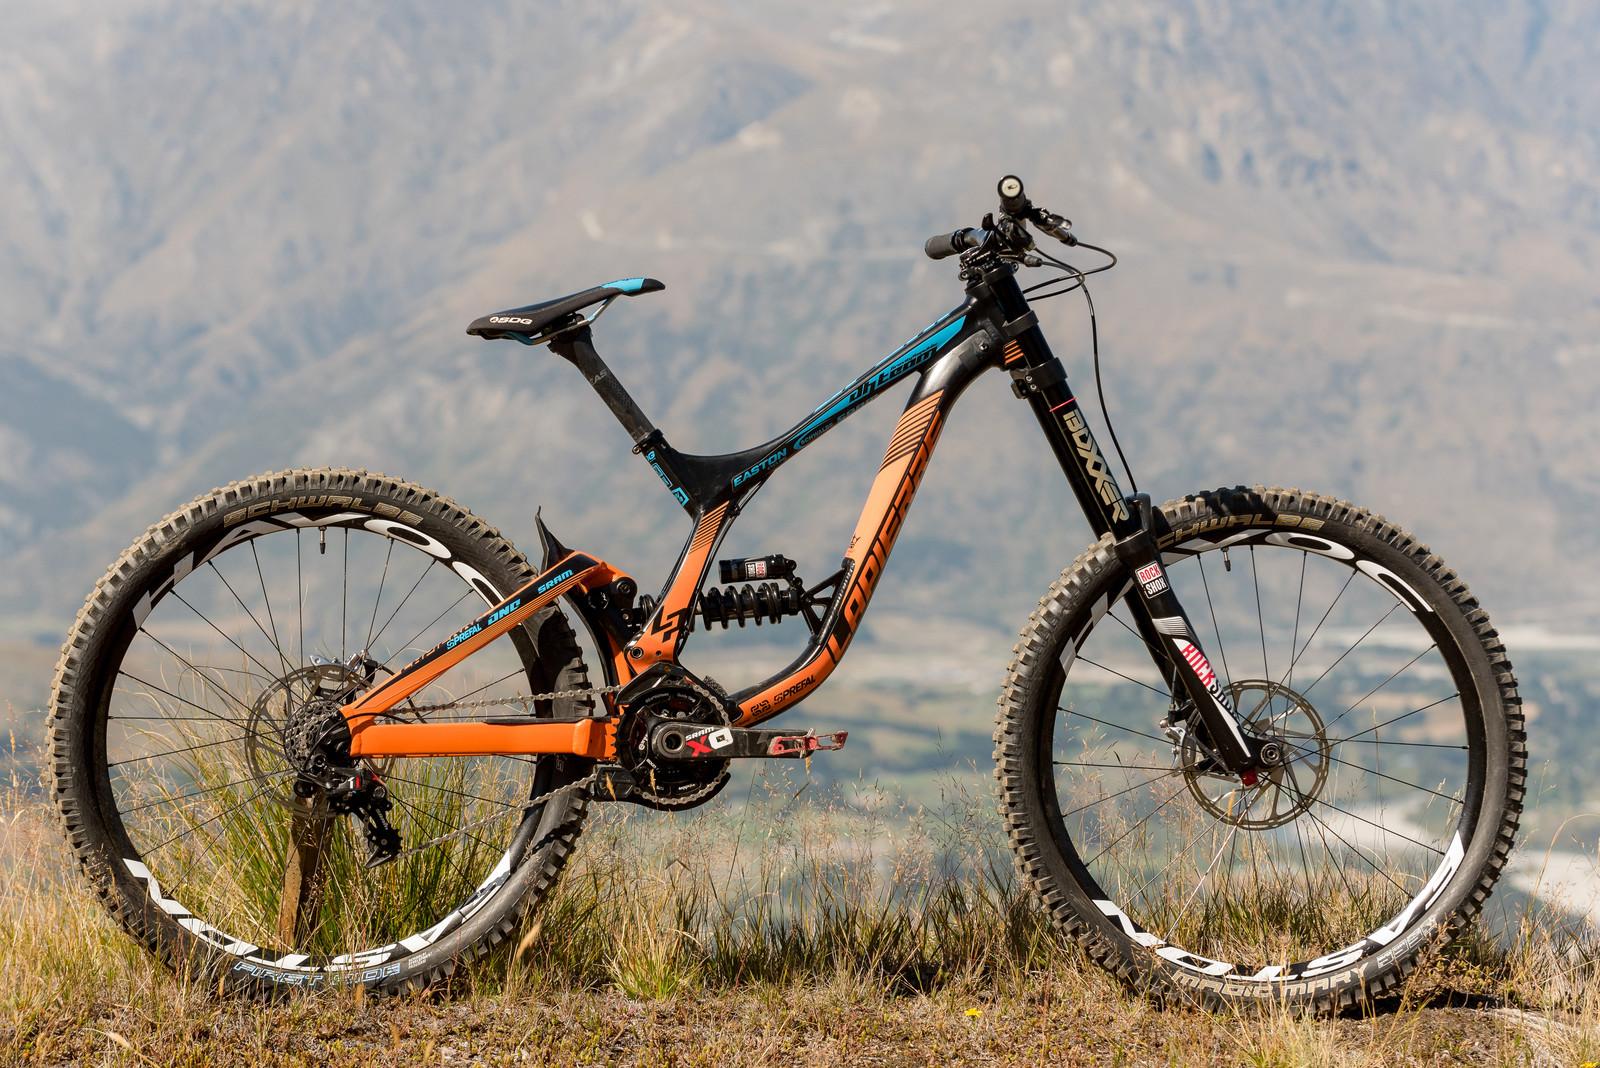 Bikes Lapierre Gravity Republic S Dh Team Bikes Pro Bikes